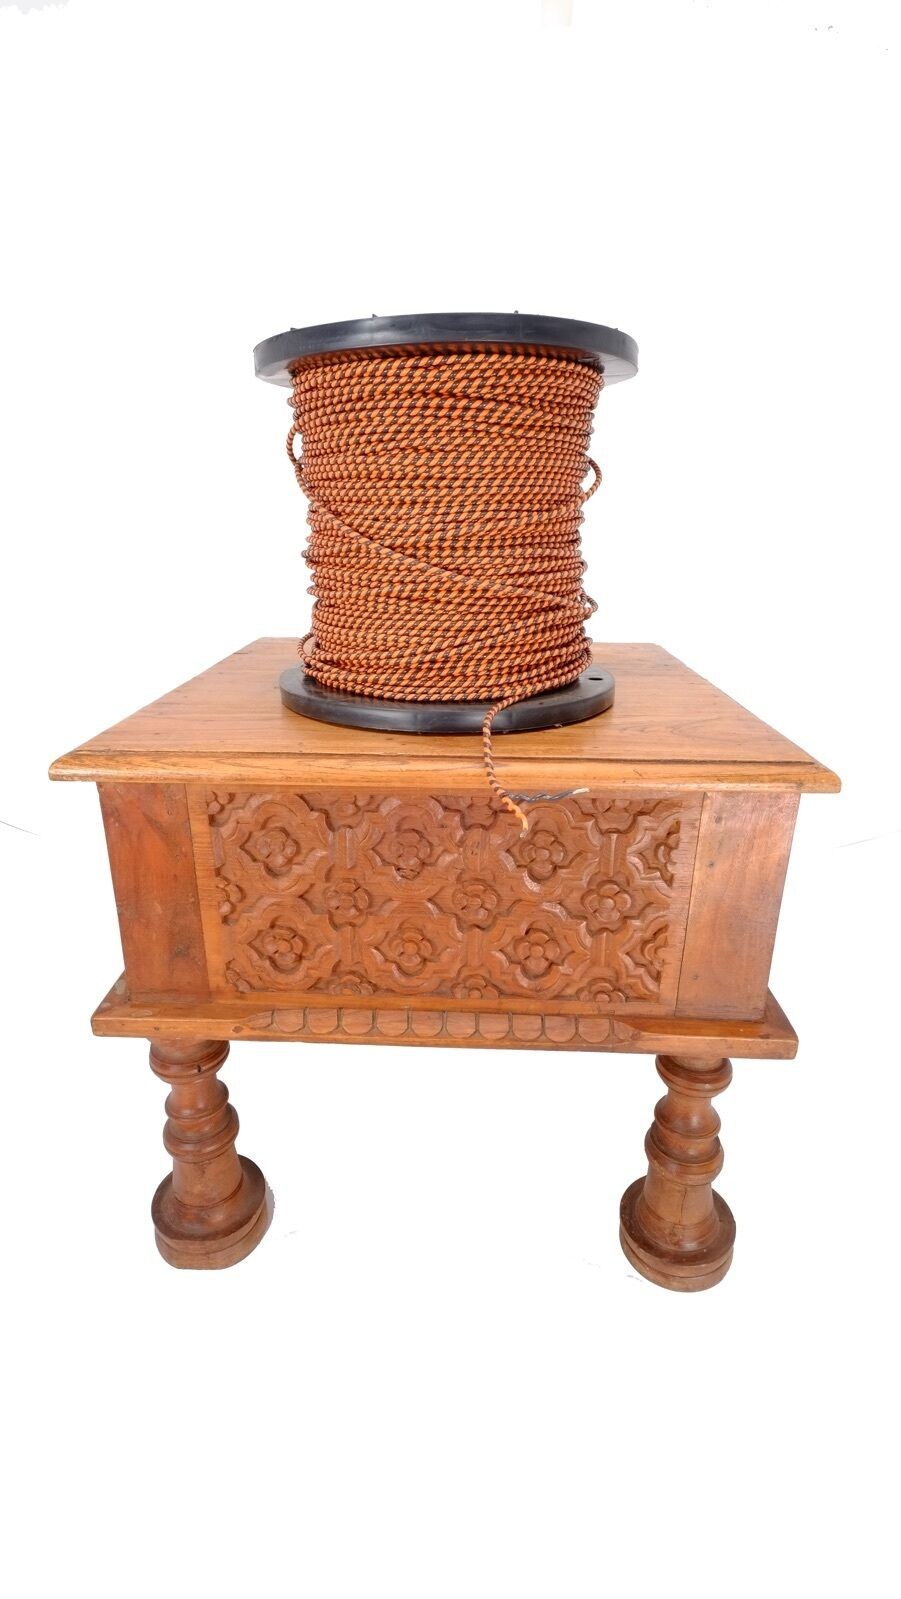 Belden 9497 Speaker Cable Per Foot Tube Altec Western Electric Shindo Audiophile